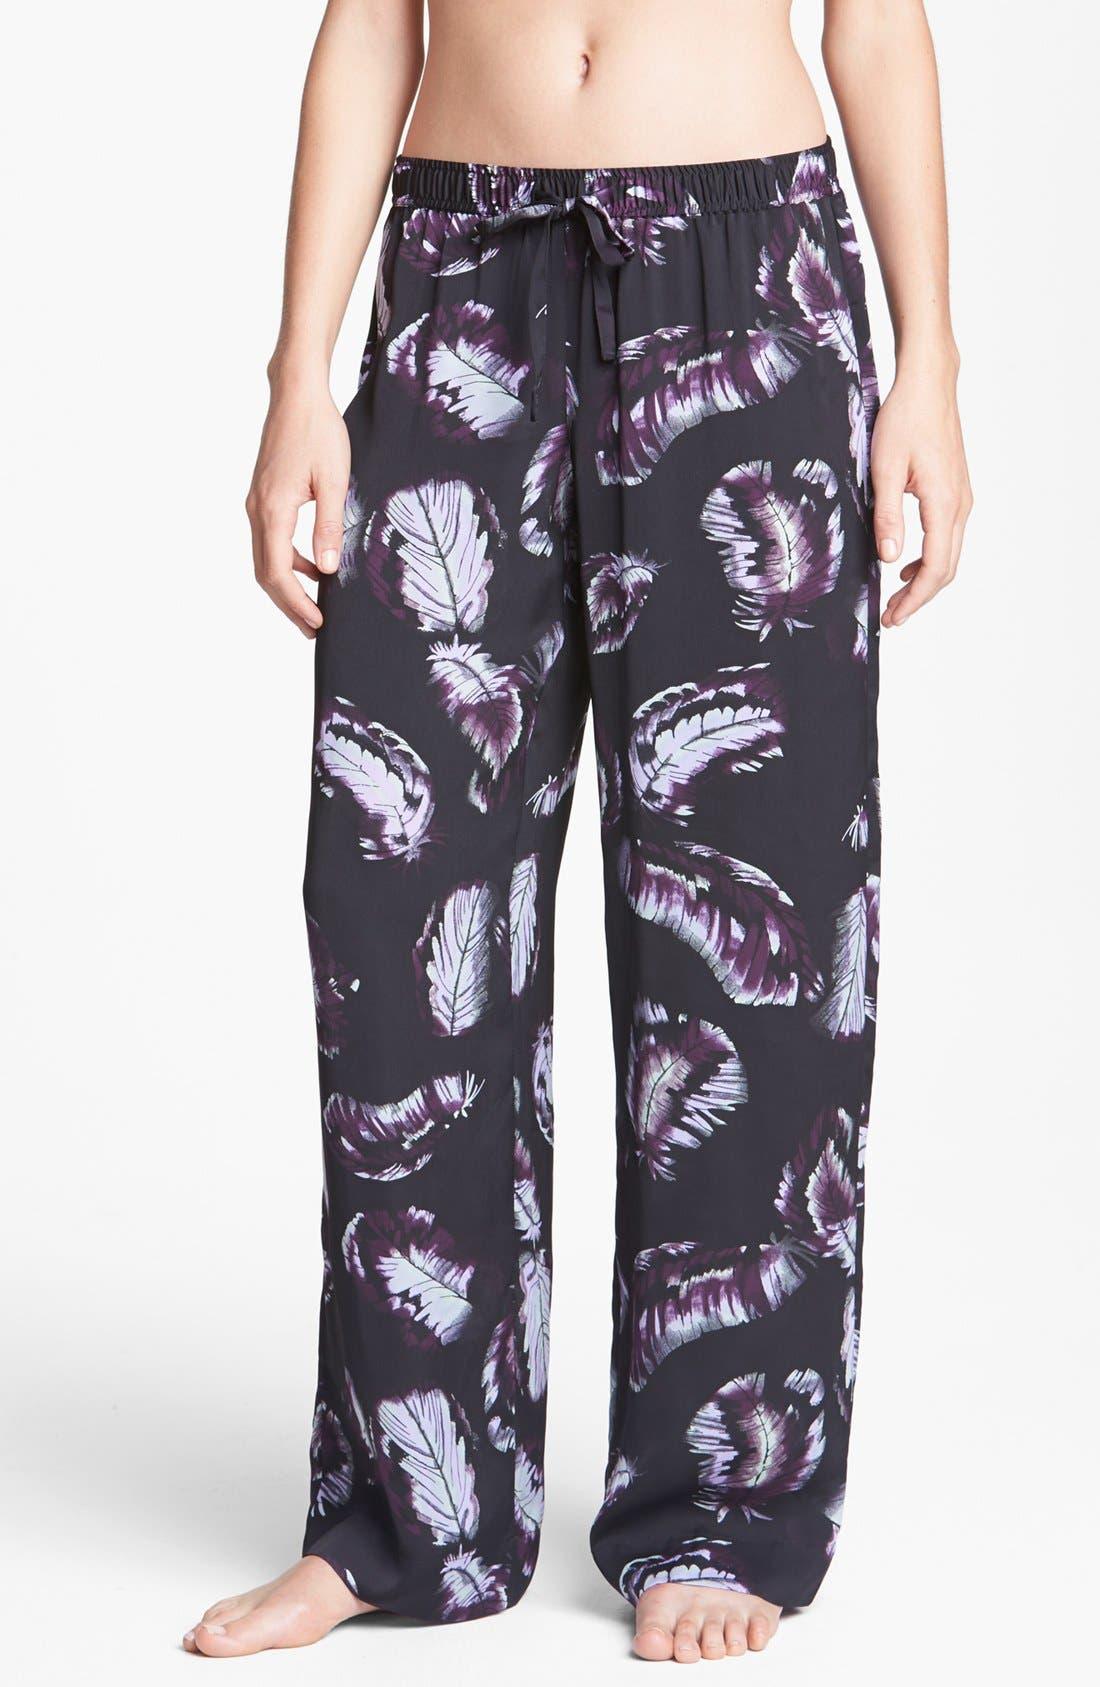 Main Image - Shimera Silky Woven Lounge Pants